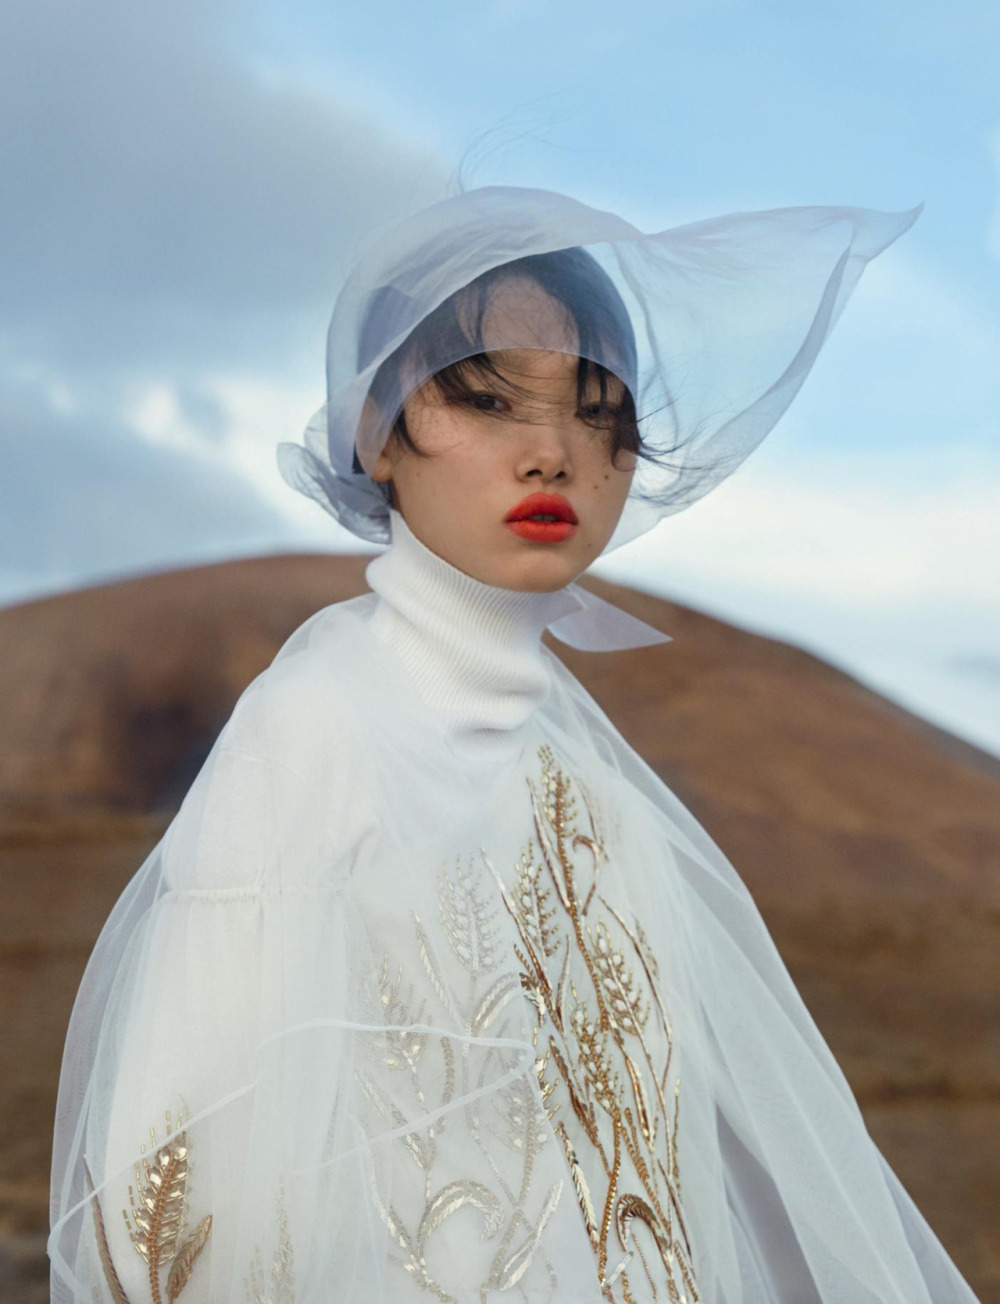 Numéro杂志#190名为《蝴蝶夫人》的时尚摄影大片由时尚摄影Txema Yeste摄影